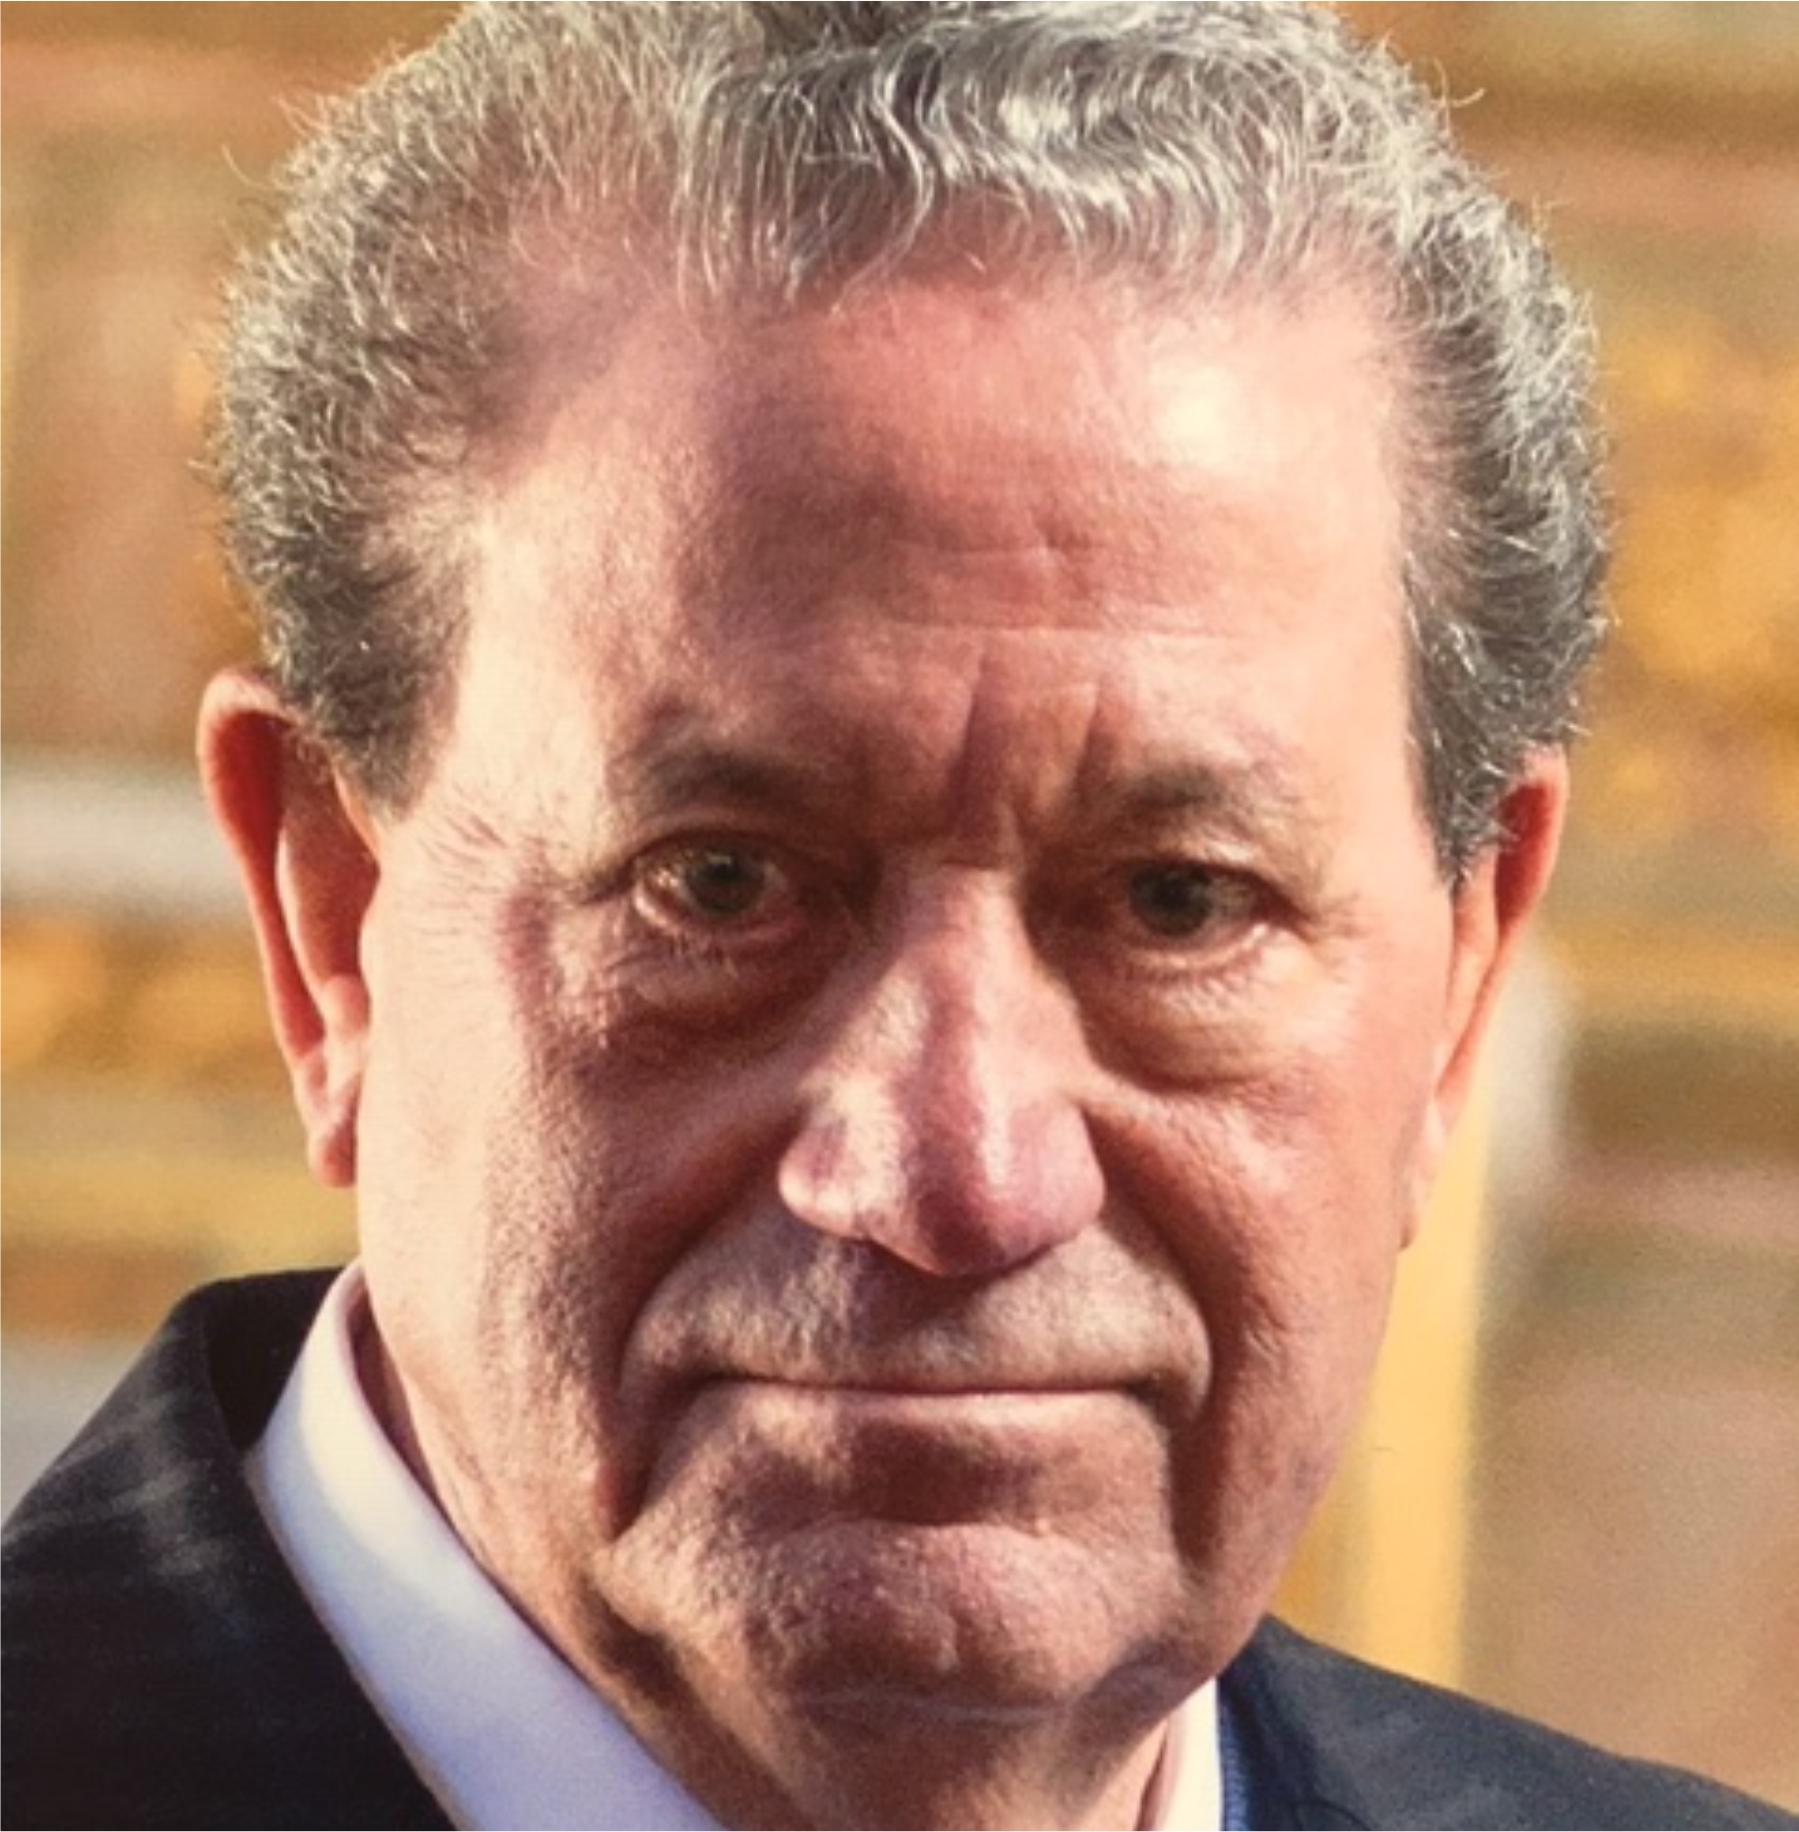 Manuel Ferreira Gaspar Neto